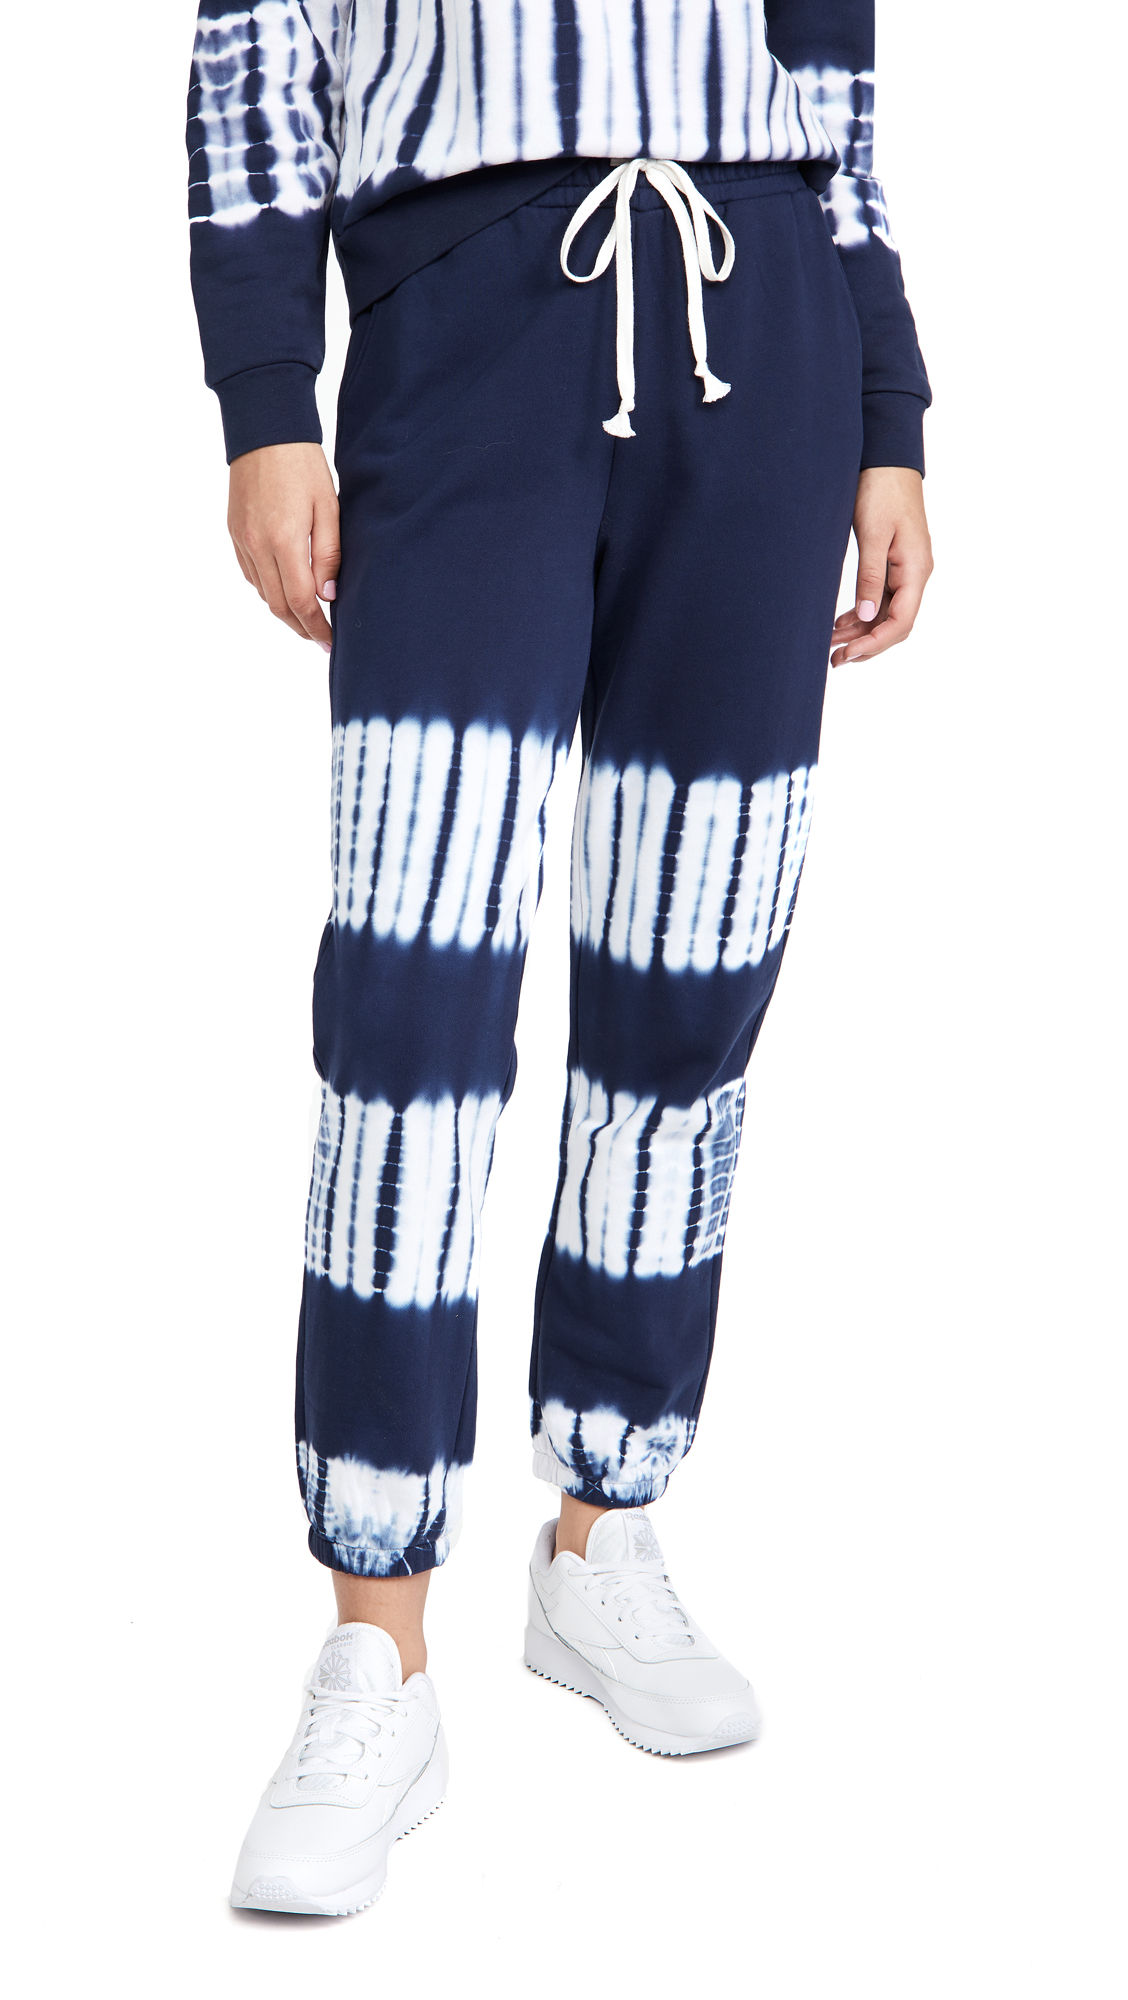 Madewell Tie-Dye Sweatpants